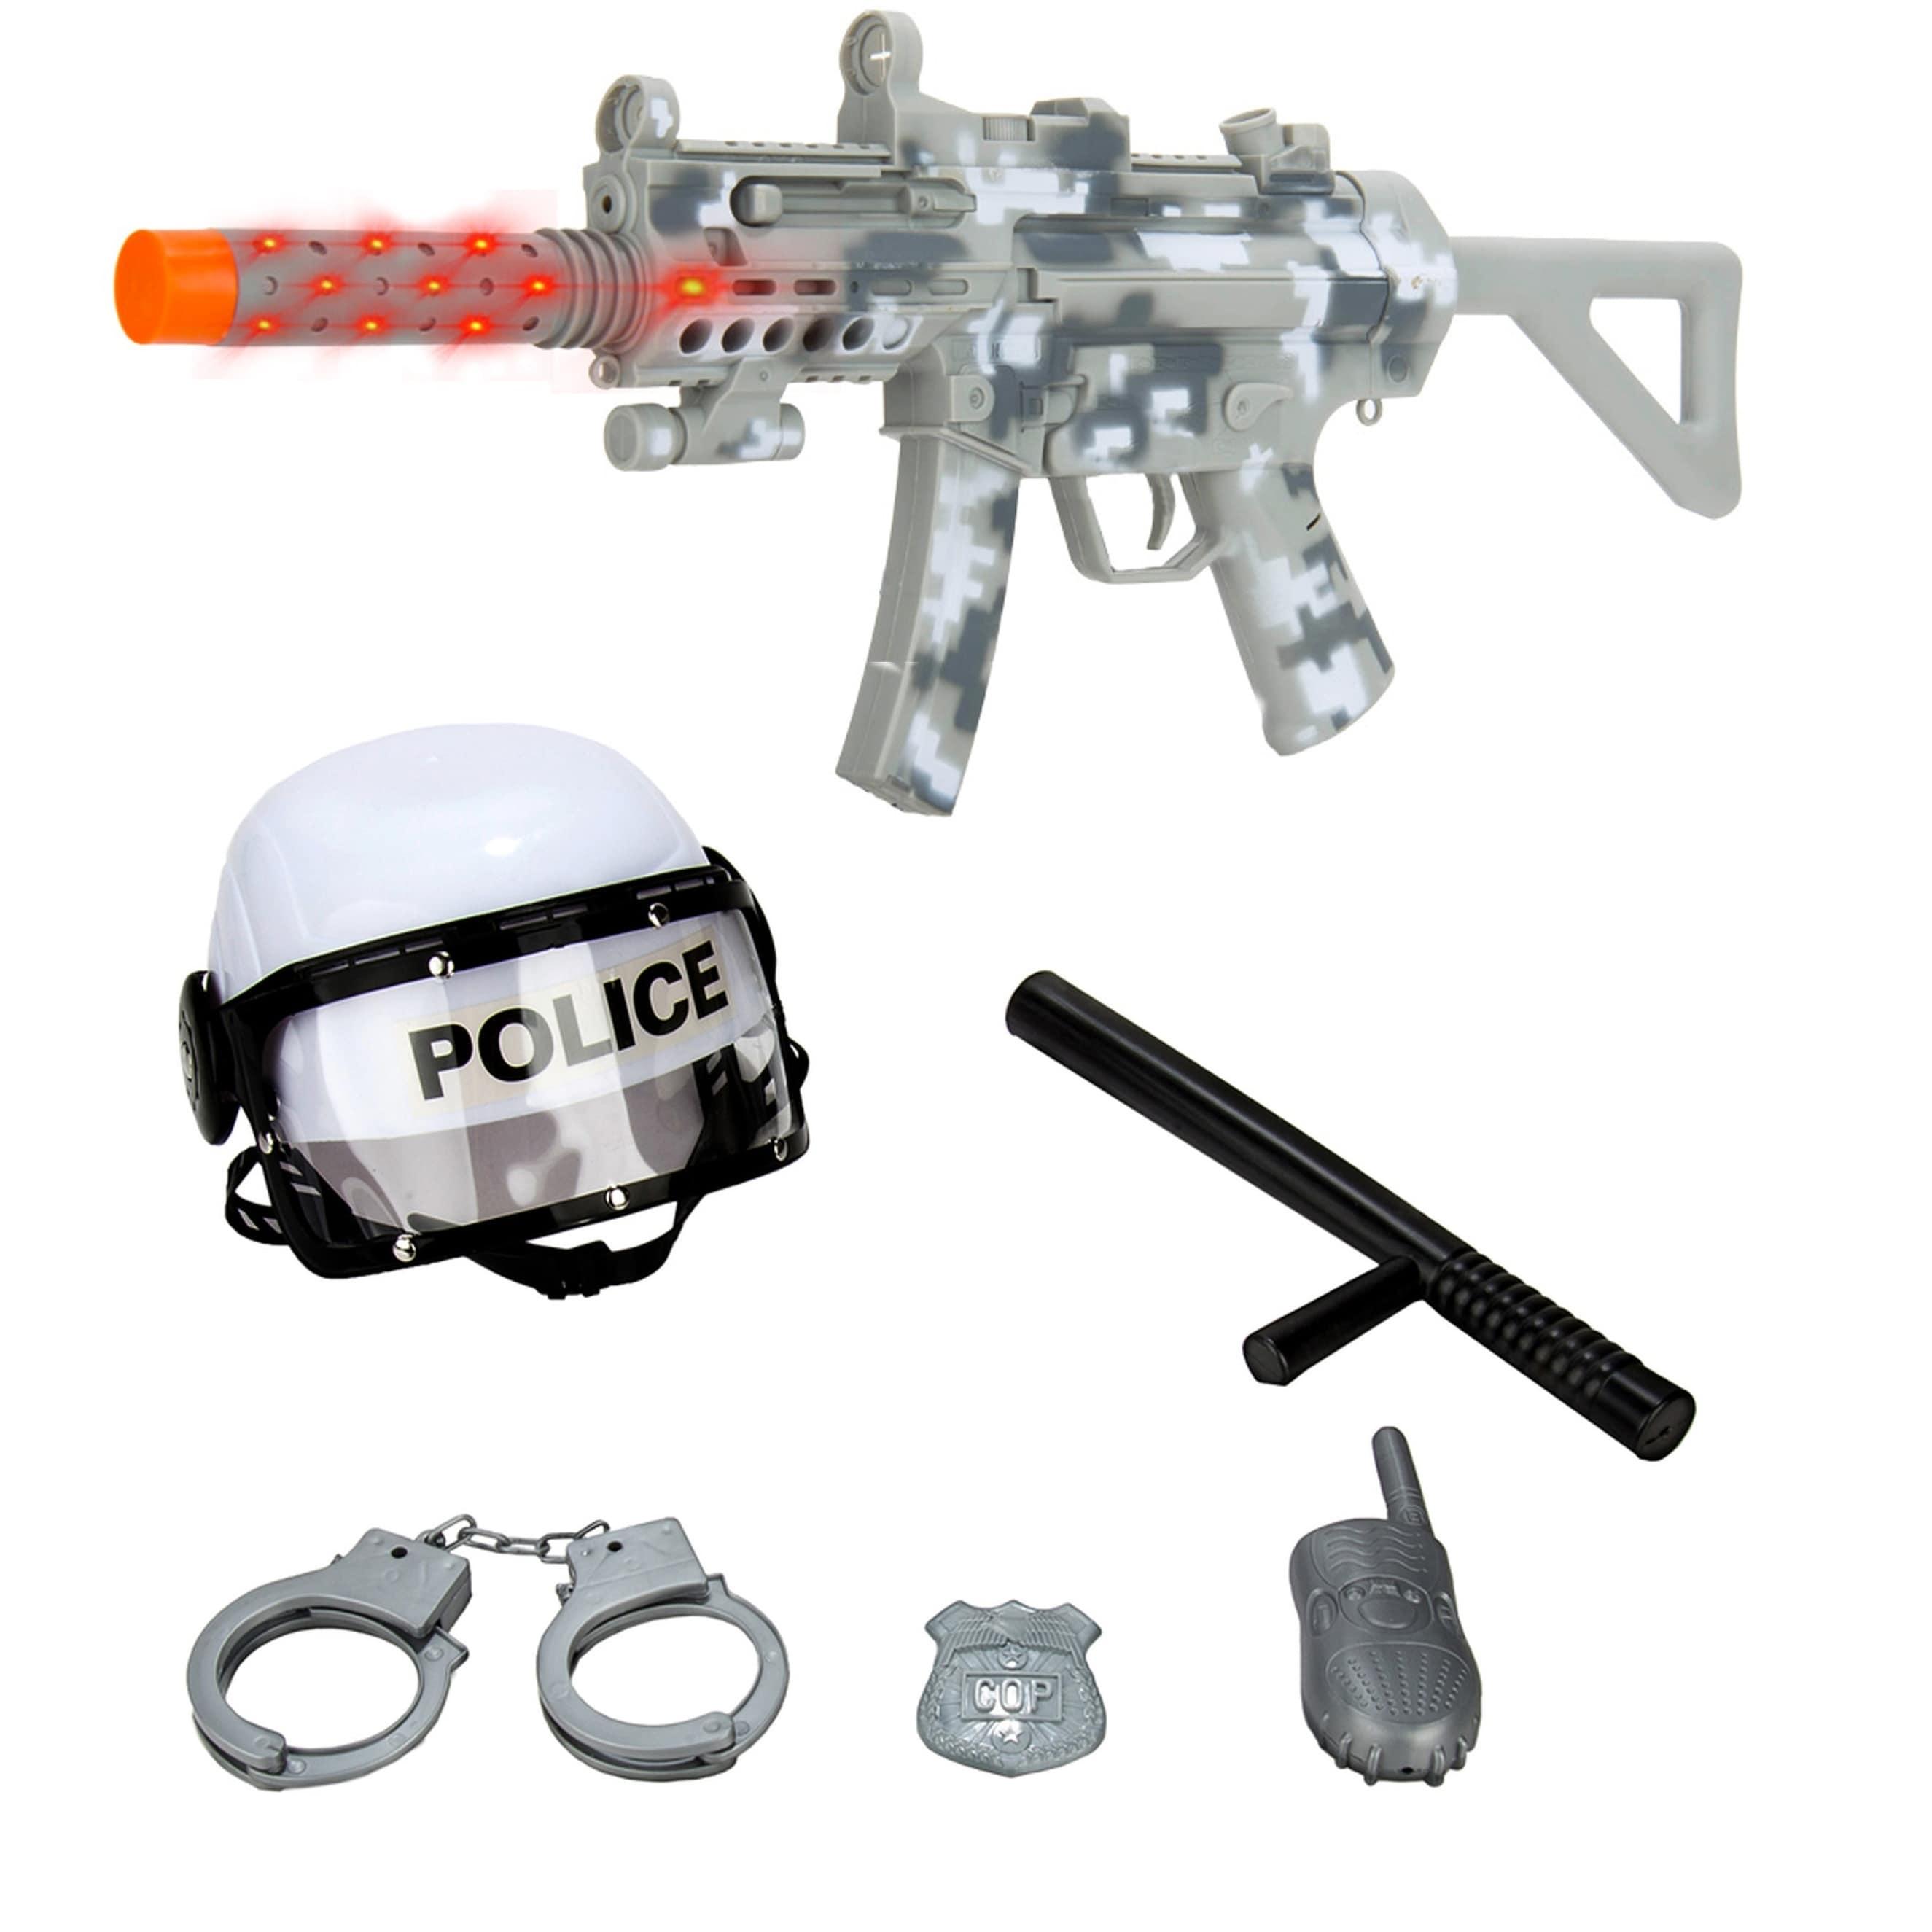 Police Combat Force y Kids Toy Gun Set with Flashing Light Sound